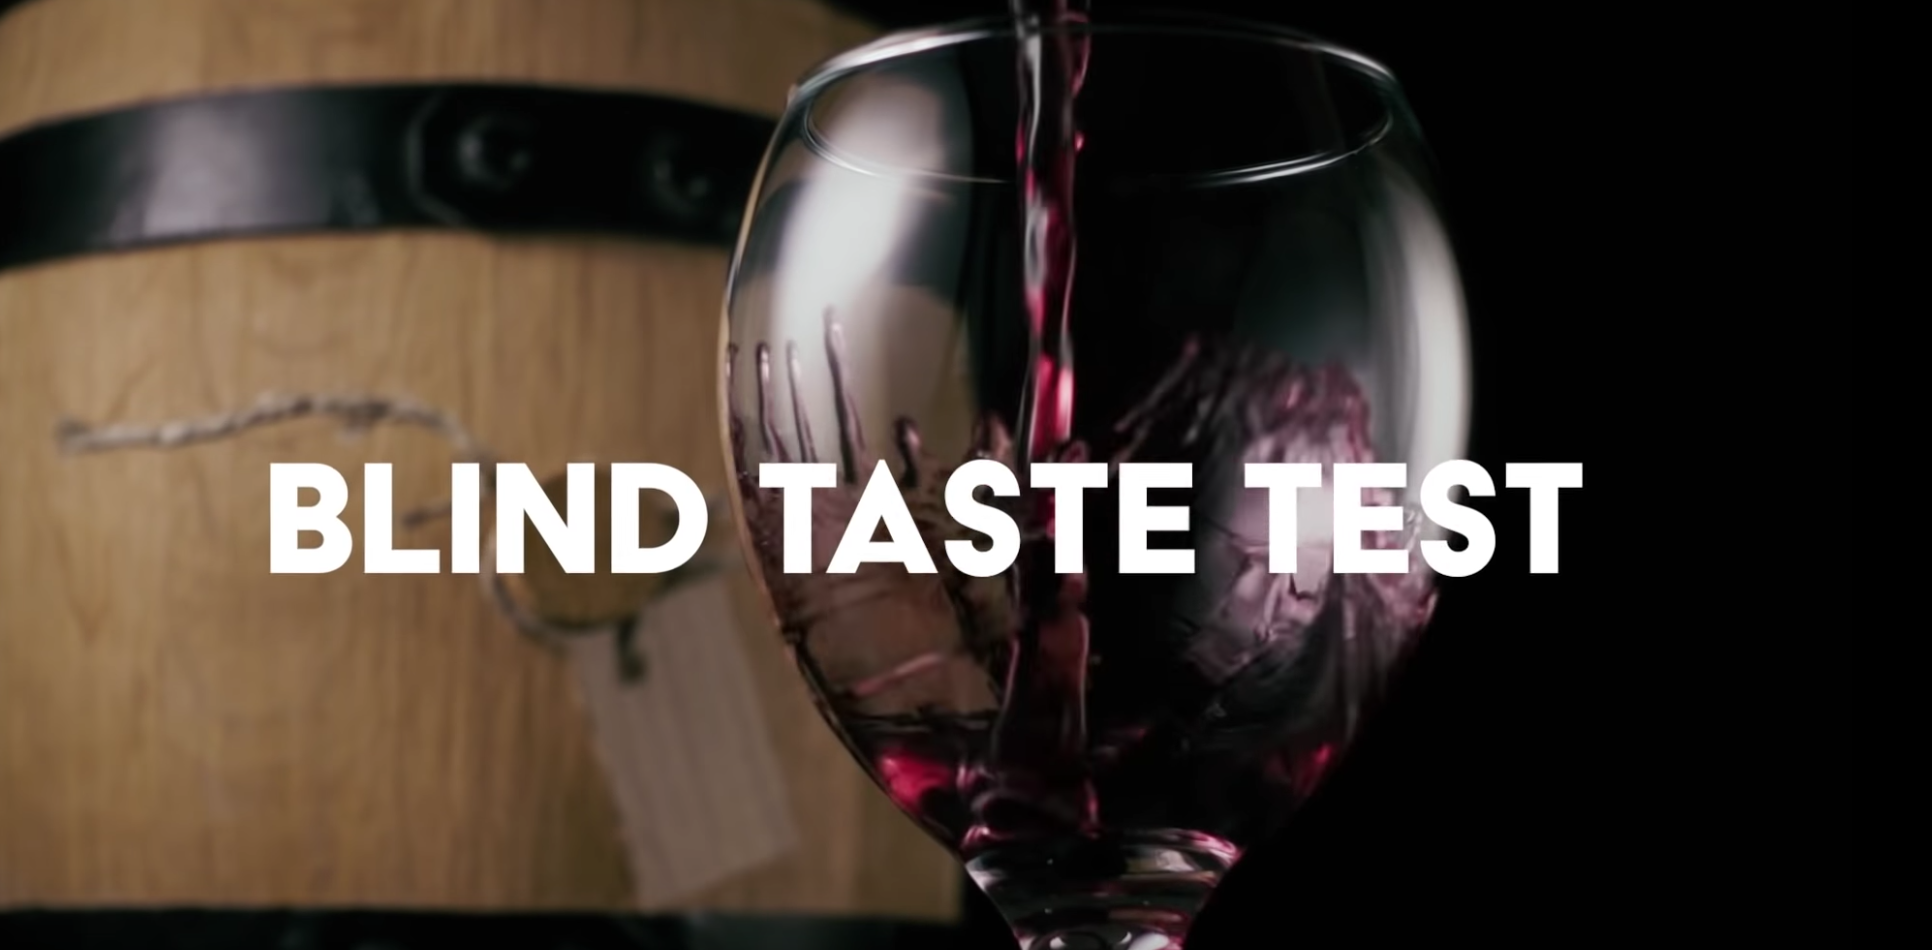 The Try Wives make Custom Wine Youtube